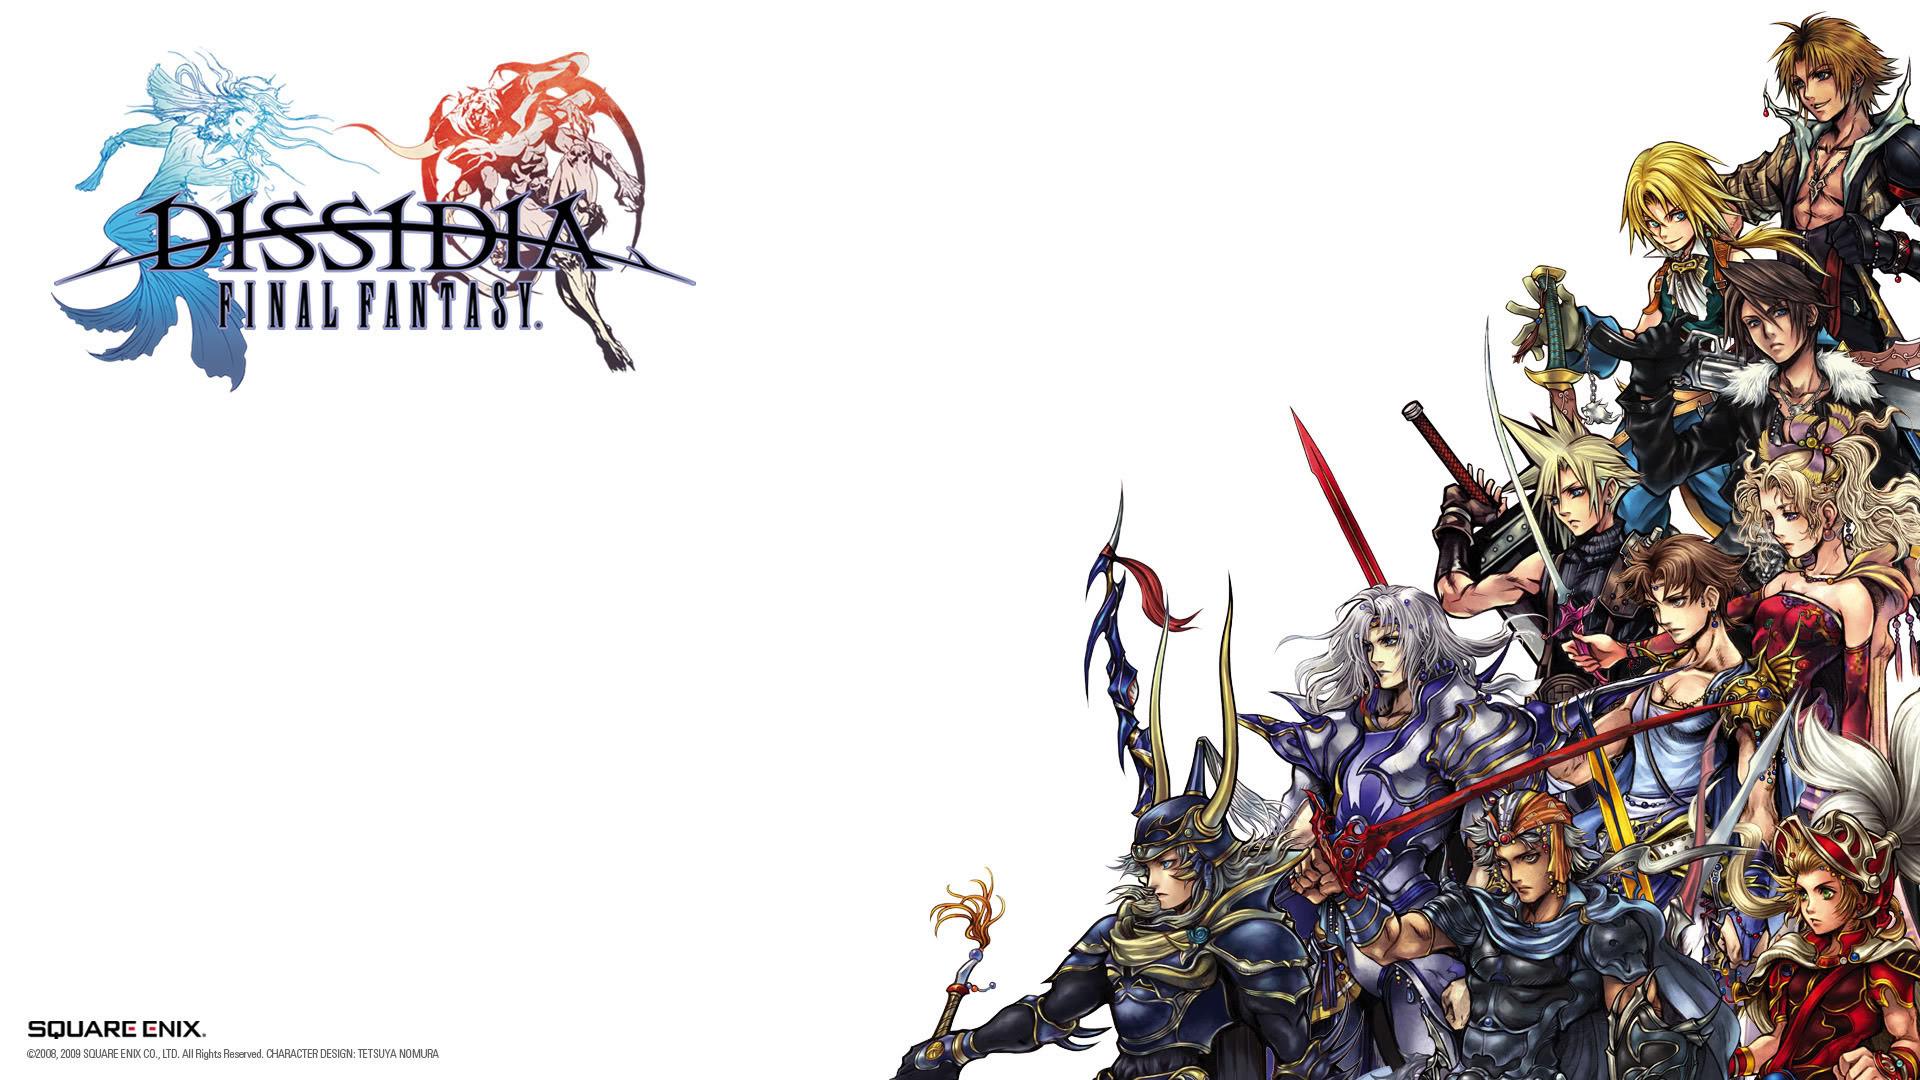 Final Fantasy Wallpaper. HD Final Fantasy Wallpaper